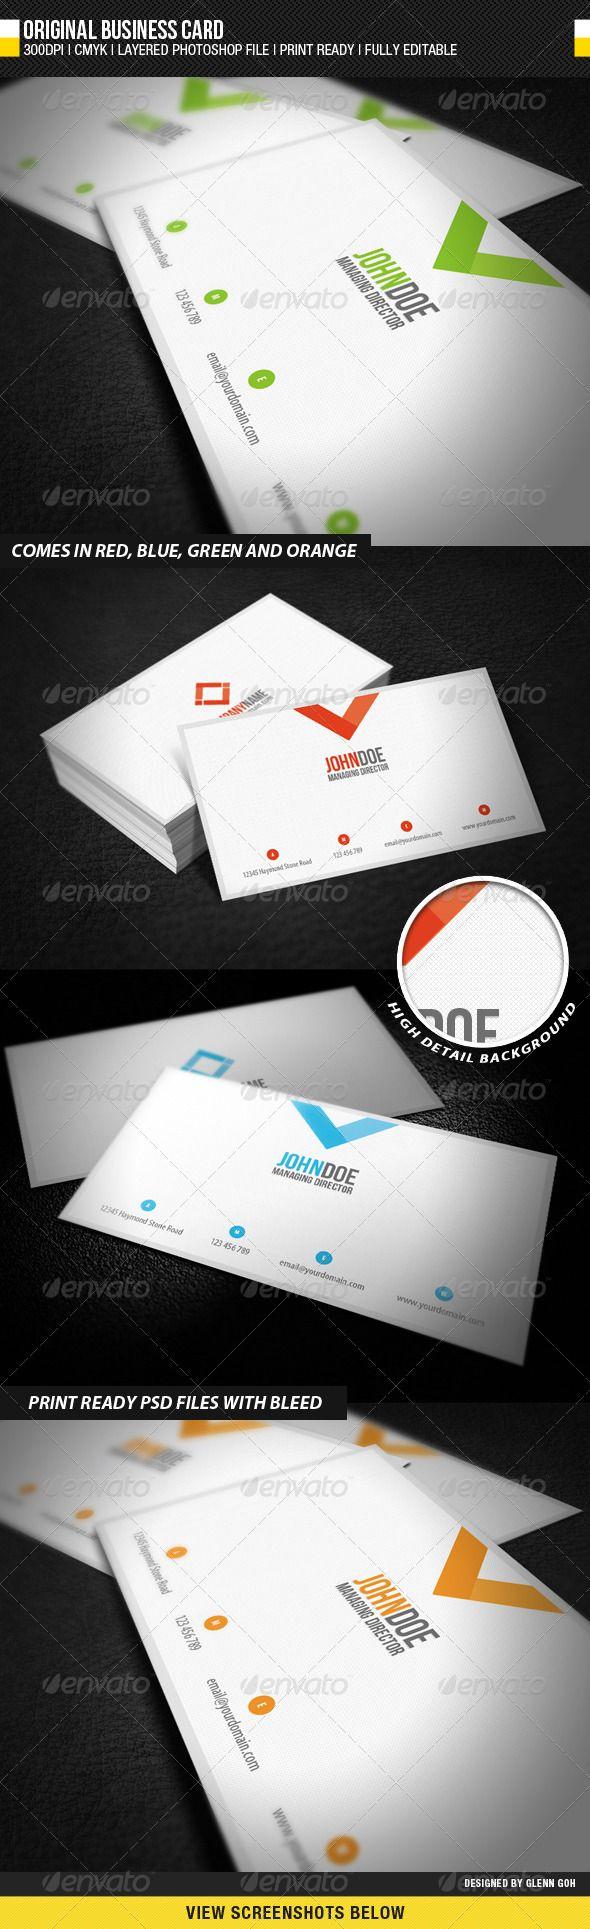 33 best Business Cards images on Pinterest | Business card design ...